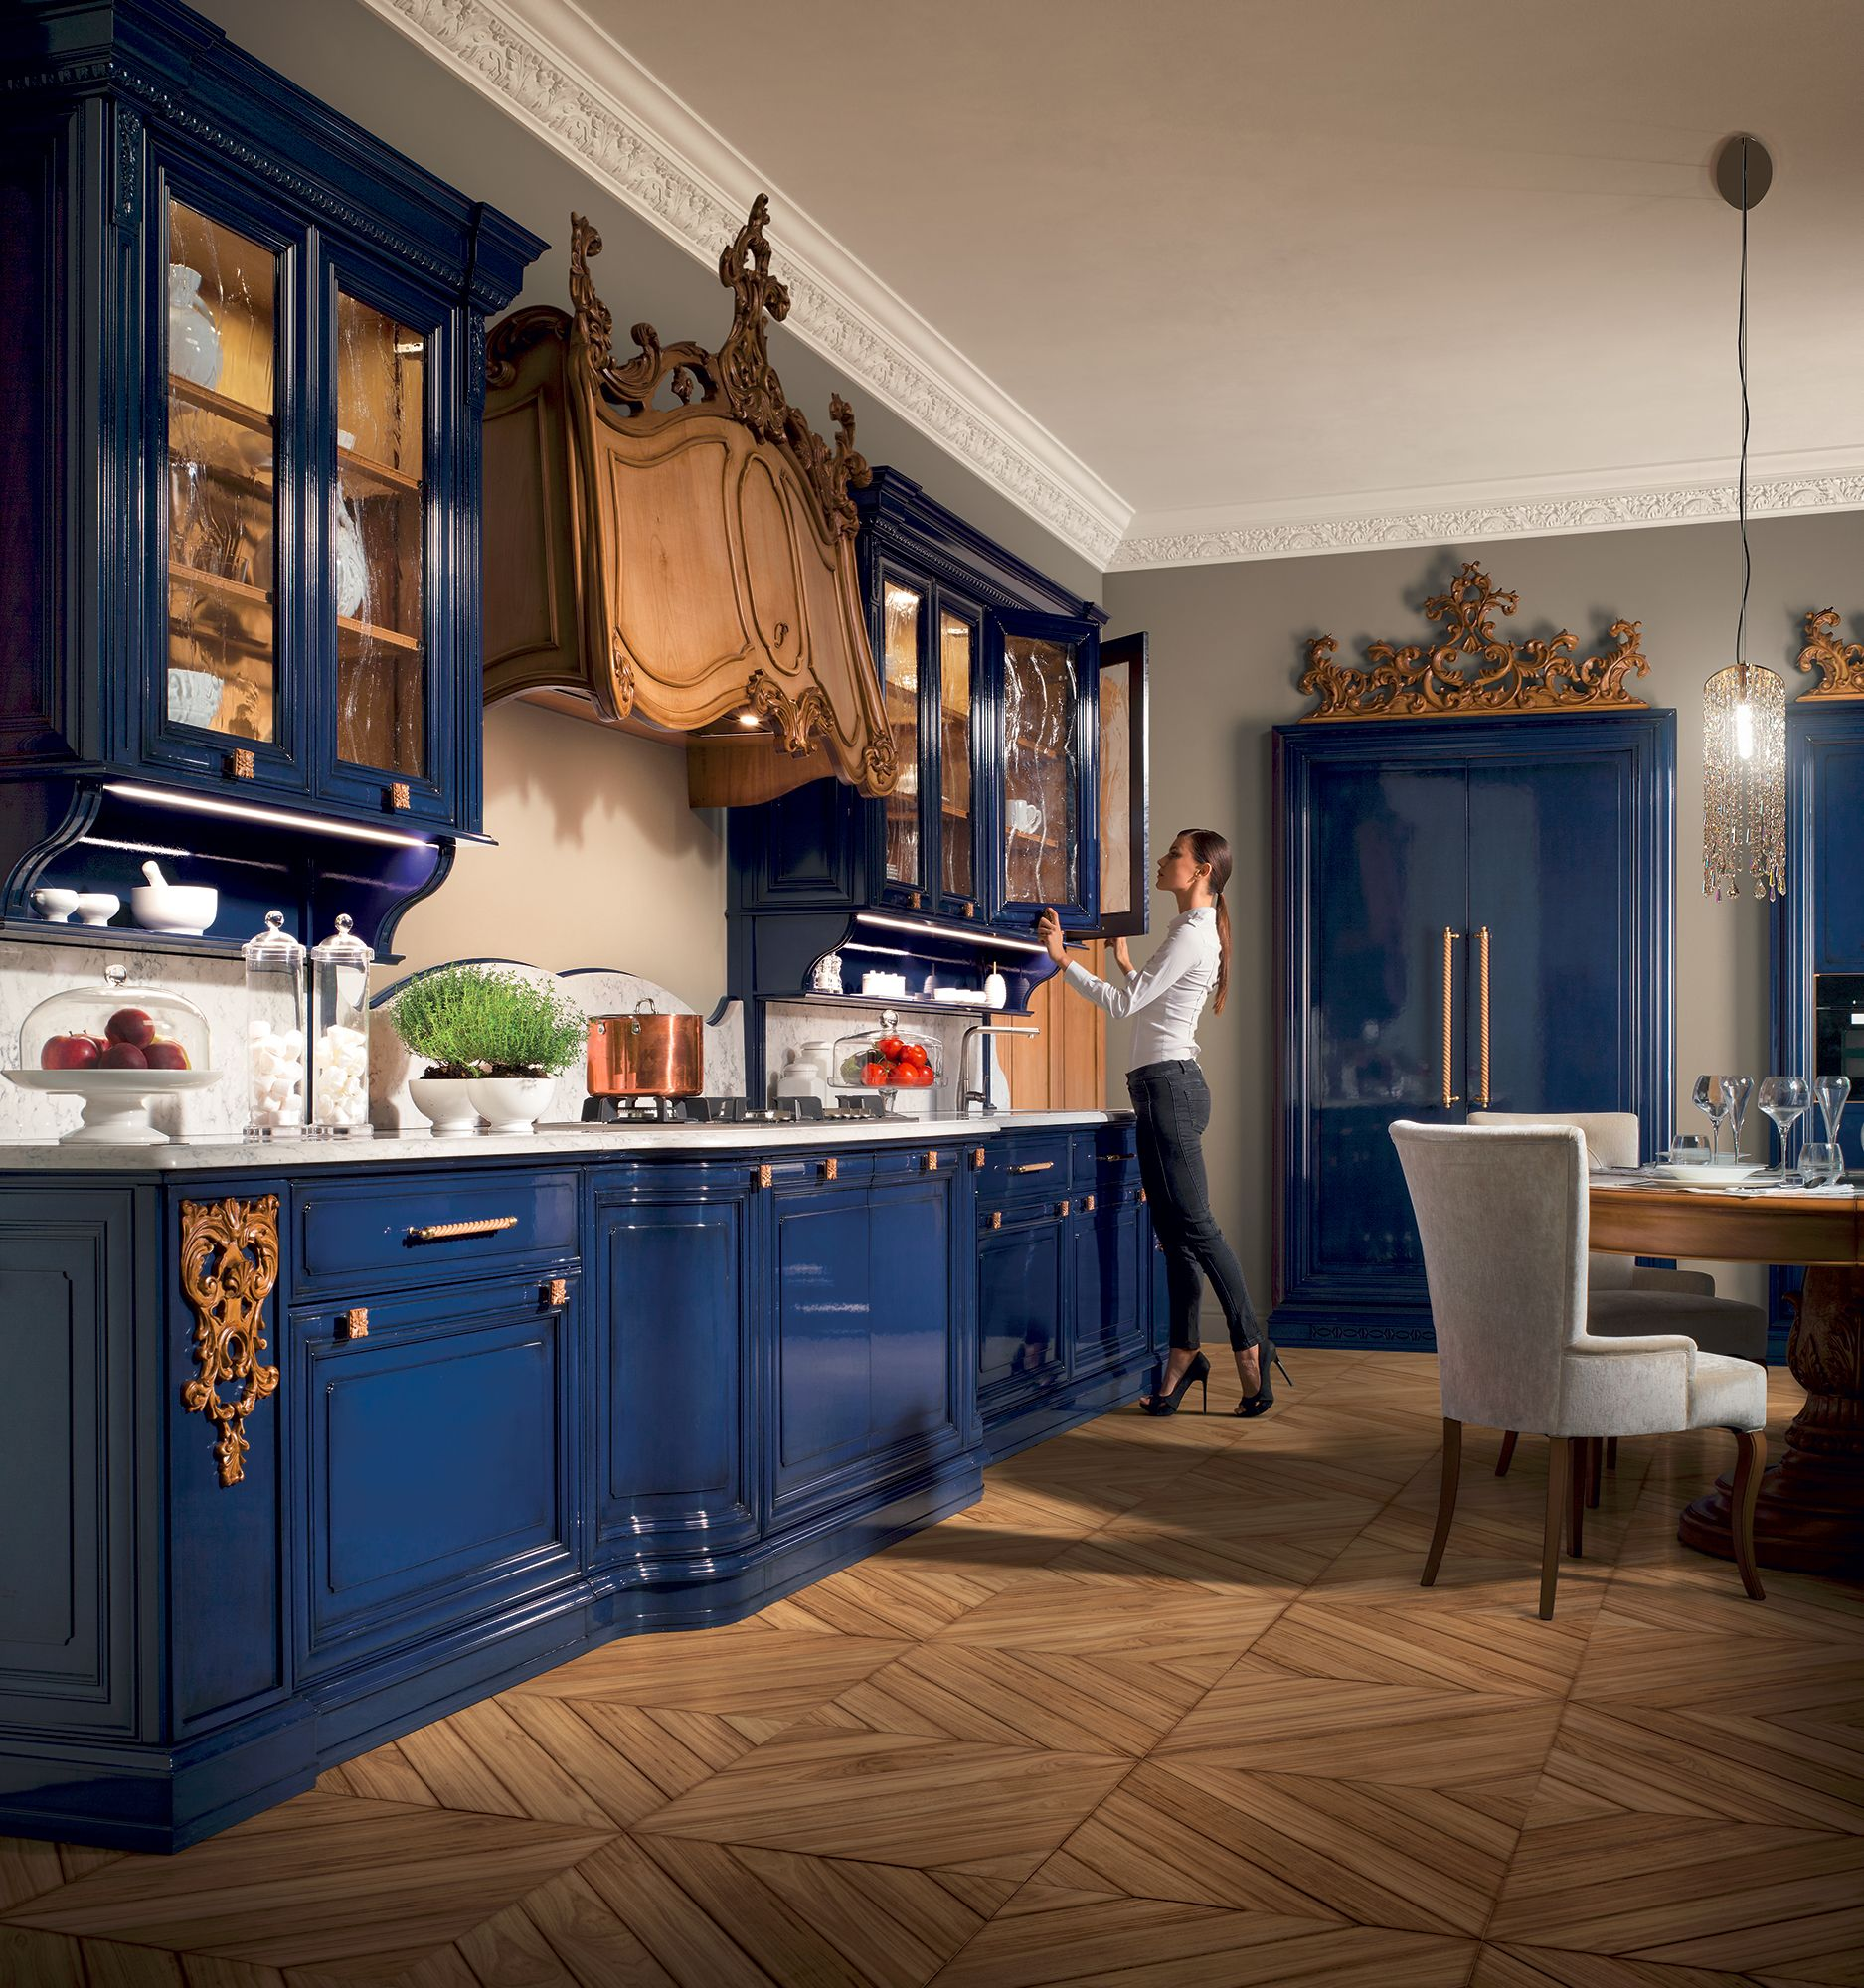 Prestige Kitchen Cabinets: Regina Goccia Di Luna Luxury Kitchen